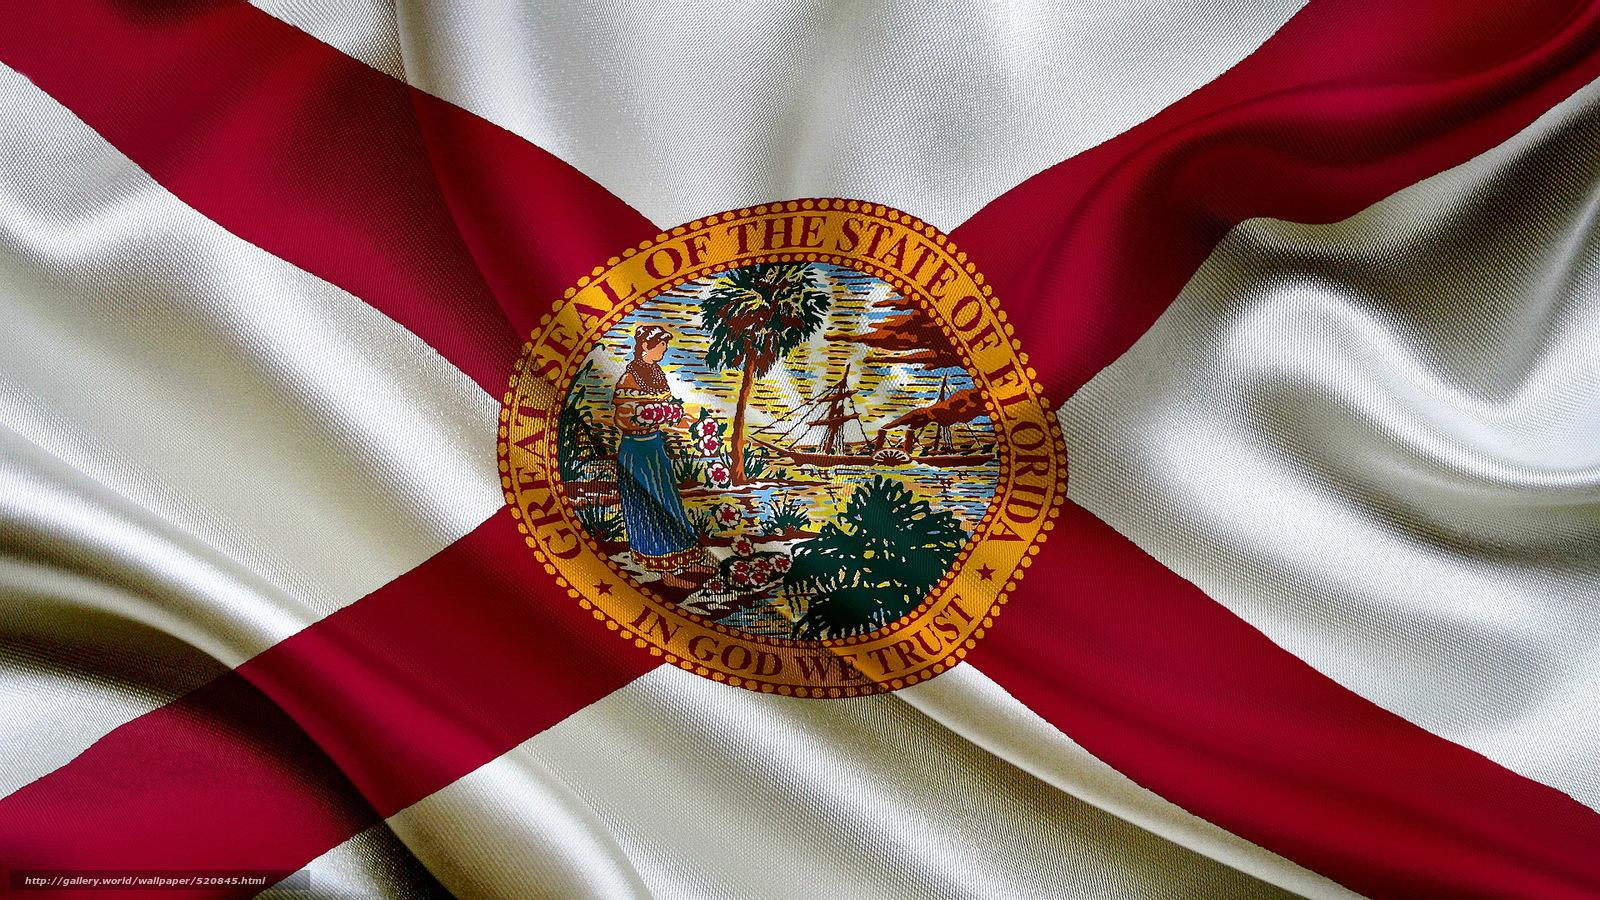 # Detox Diet Breastfeeding Baby Rashes - Arizona Florida state flag photo